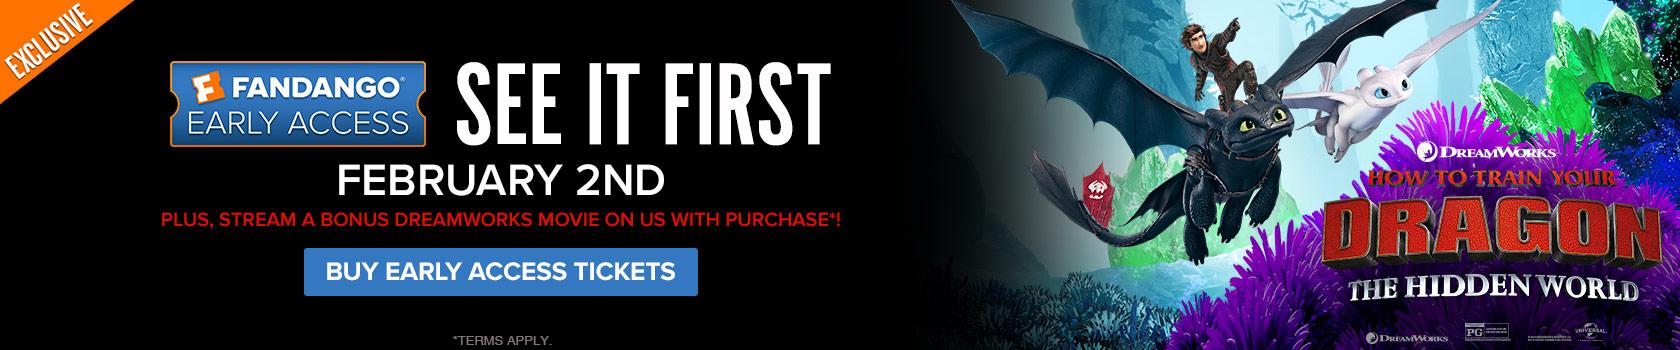 Fandango 'How to Train Your Dragon: The Hidden World' Early Access Screening